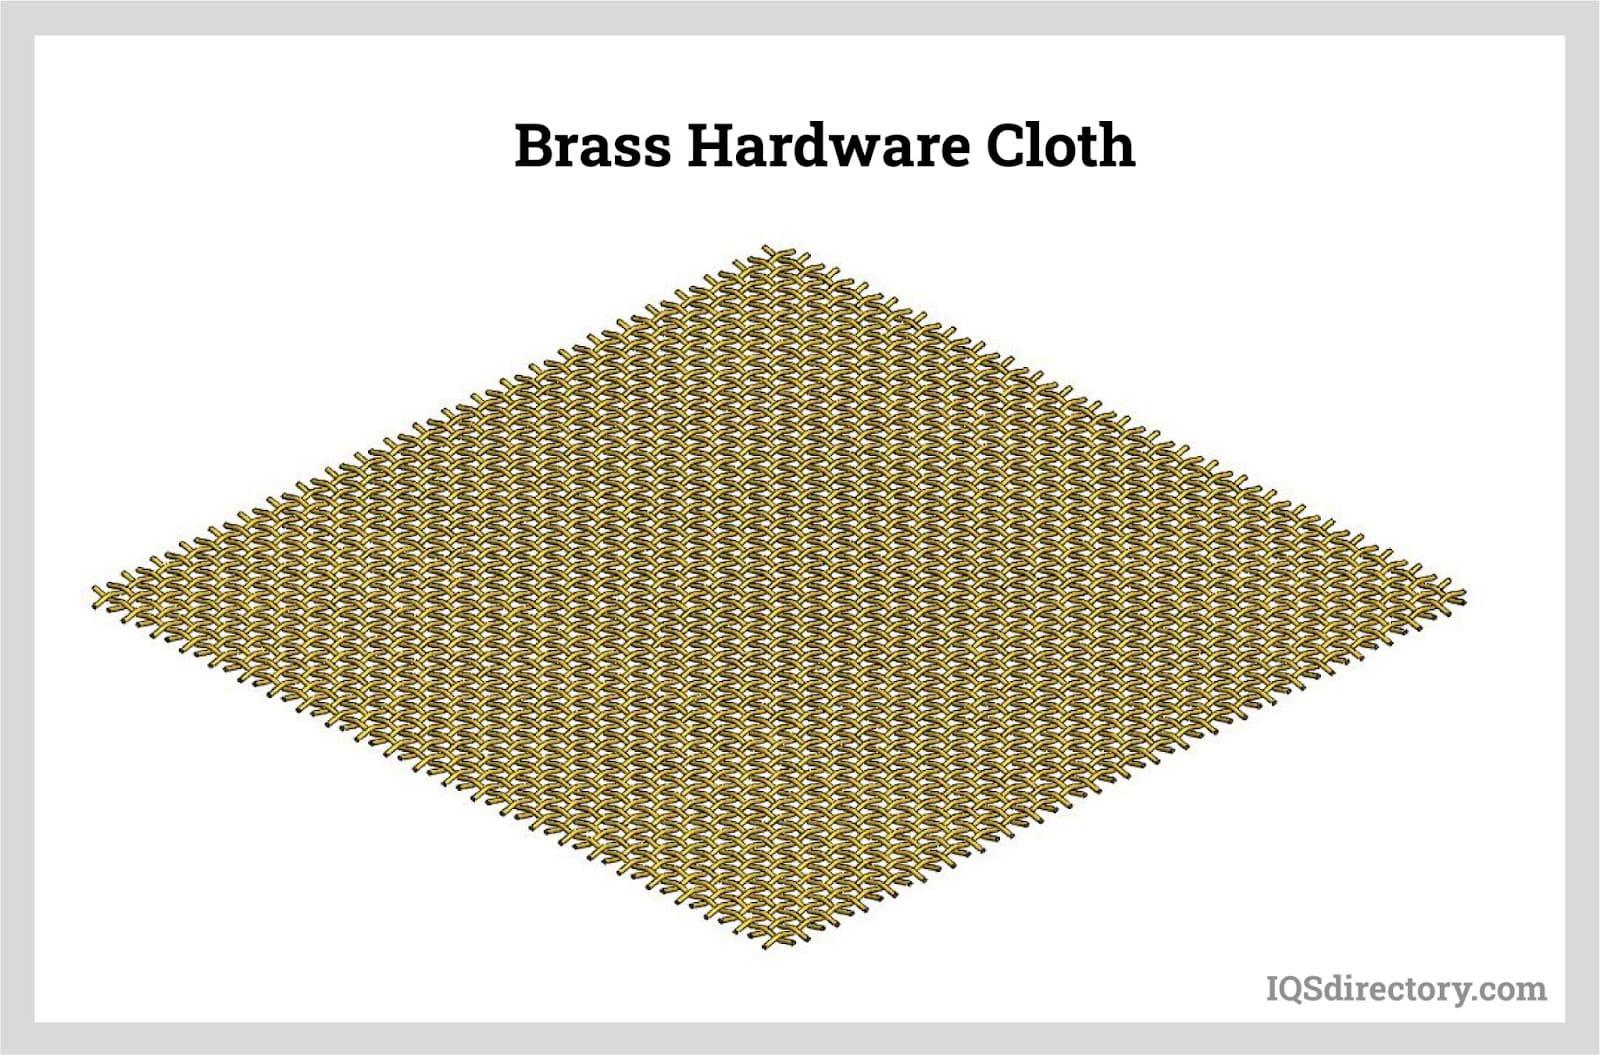 Brass Hardware Cloth